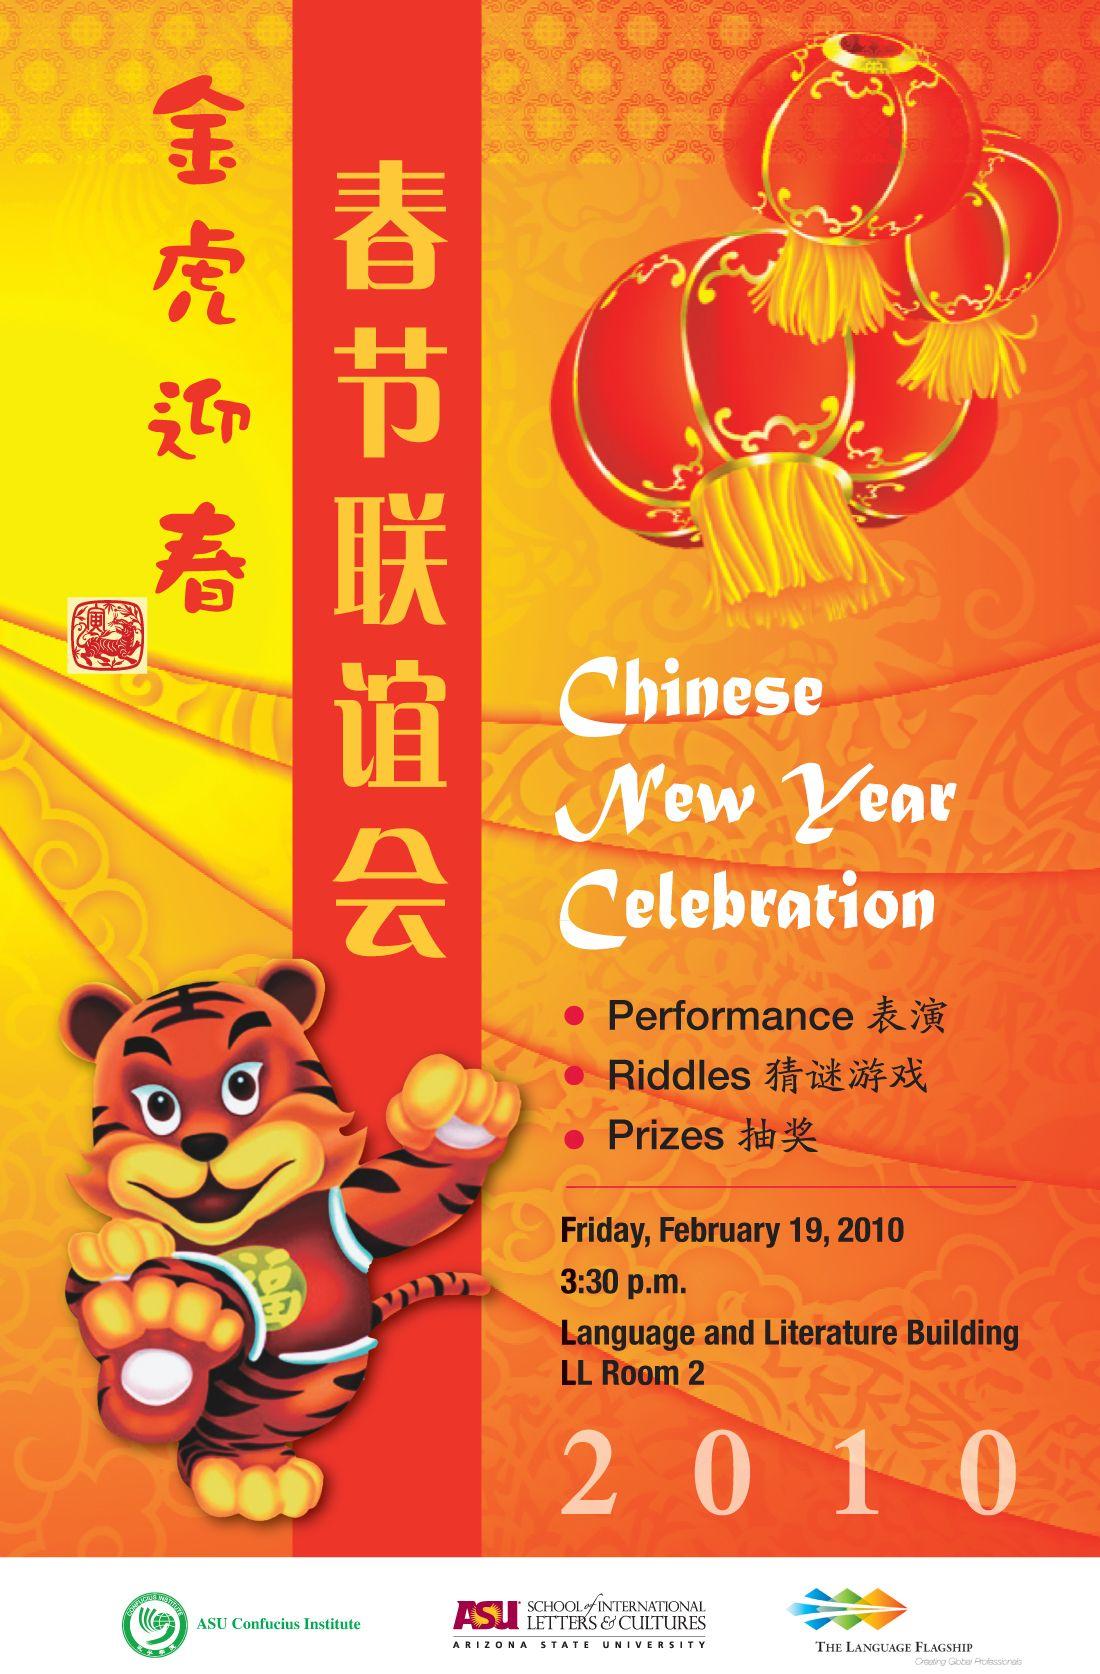 2010Tiger New year celebration, February 19, Literature